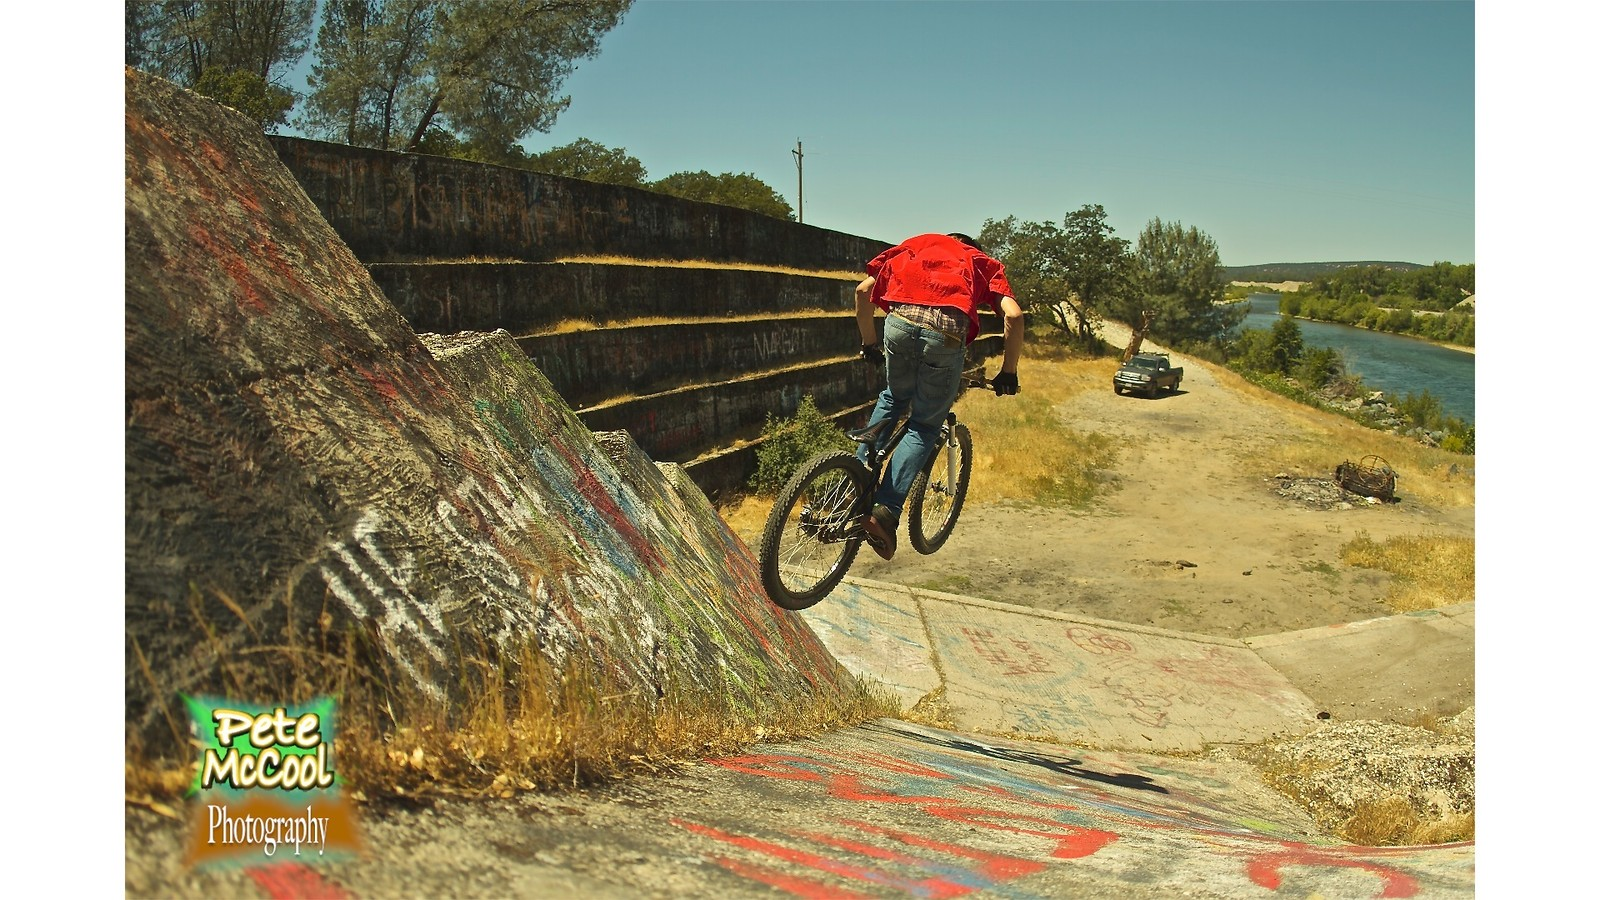 Evan Ames - Bored Rainy Day - Mountain Biking Pictures - Vital MTB